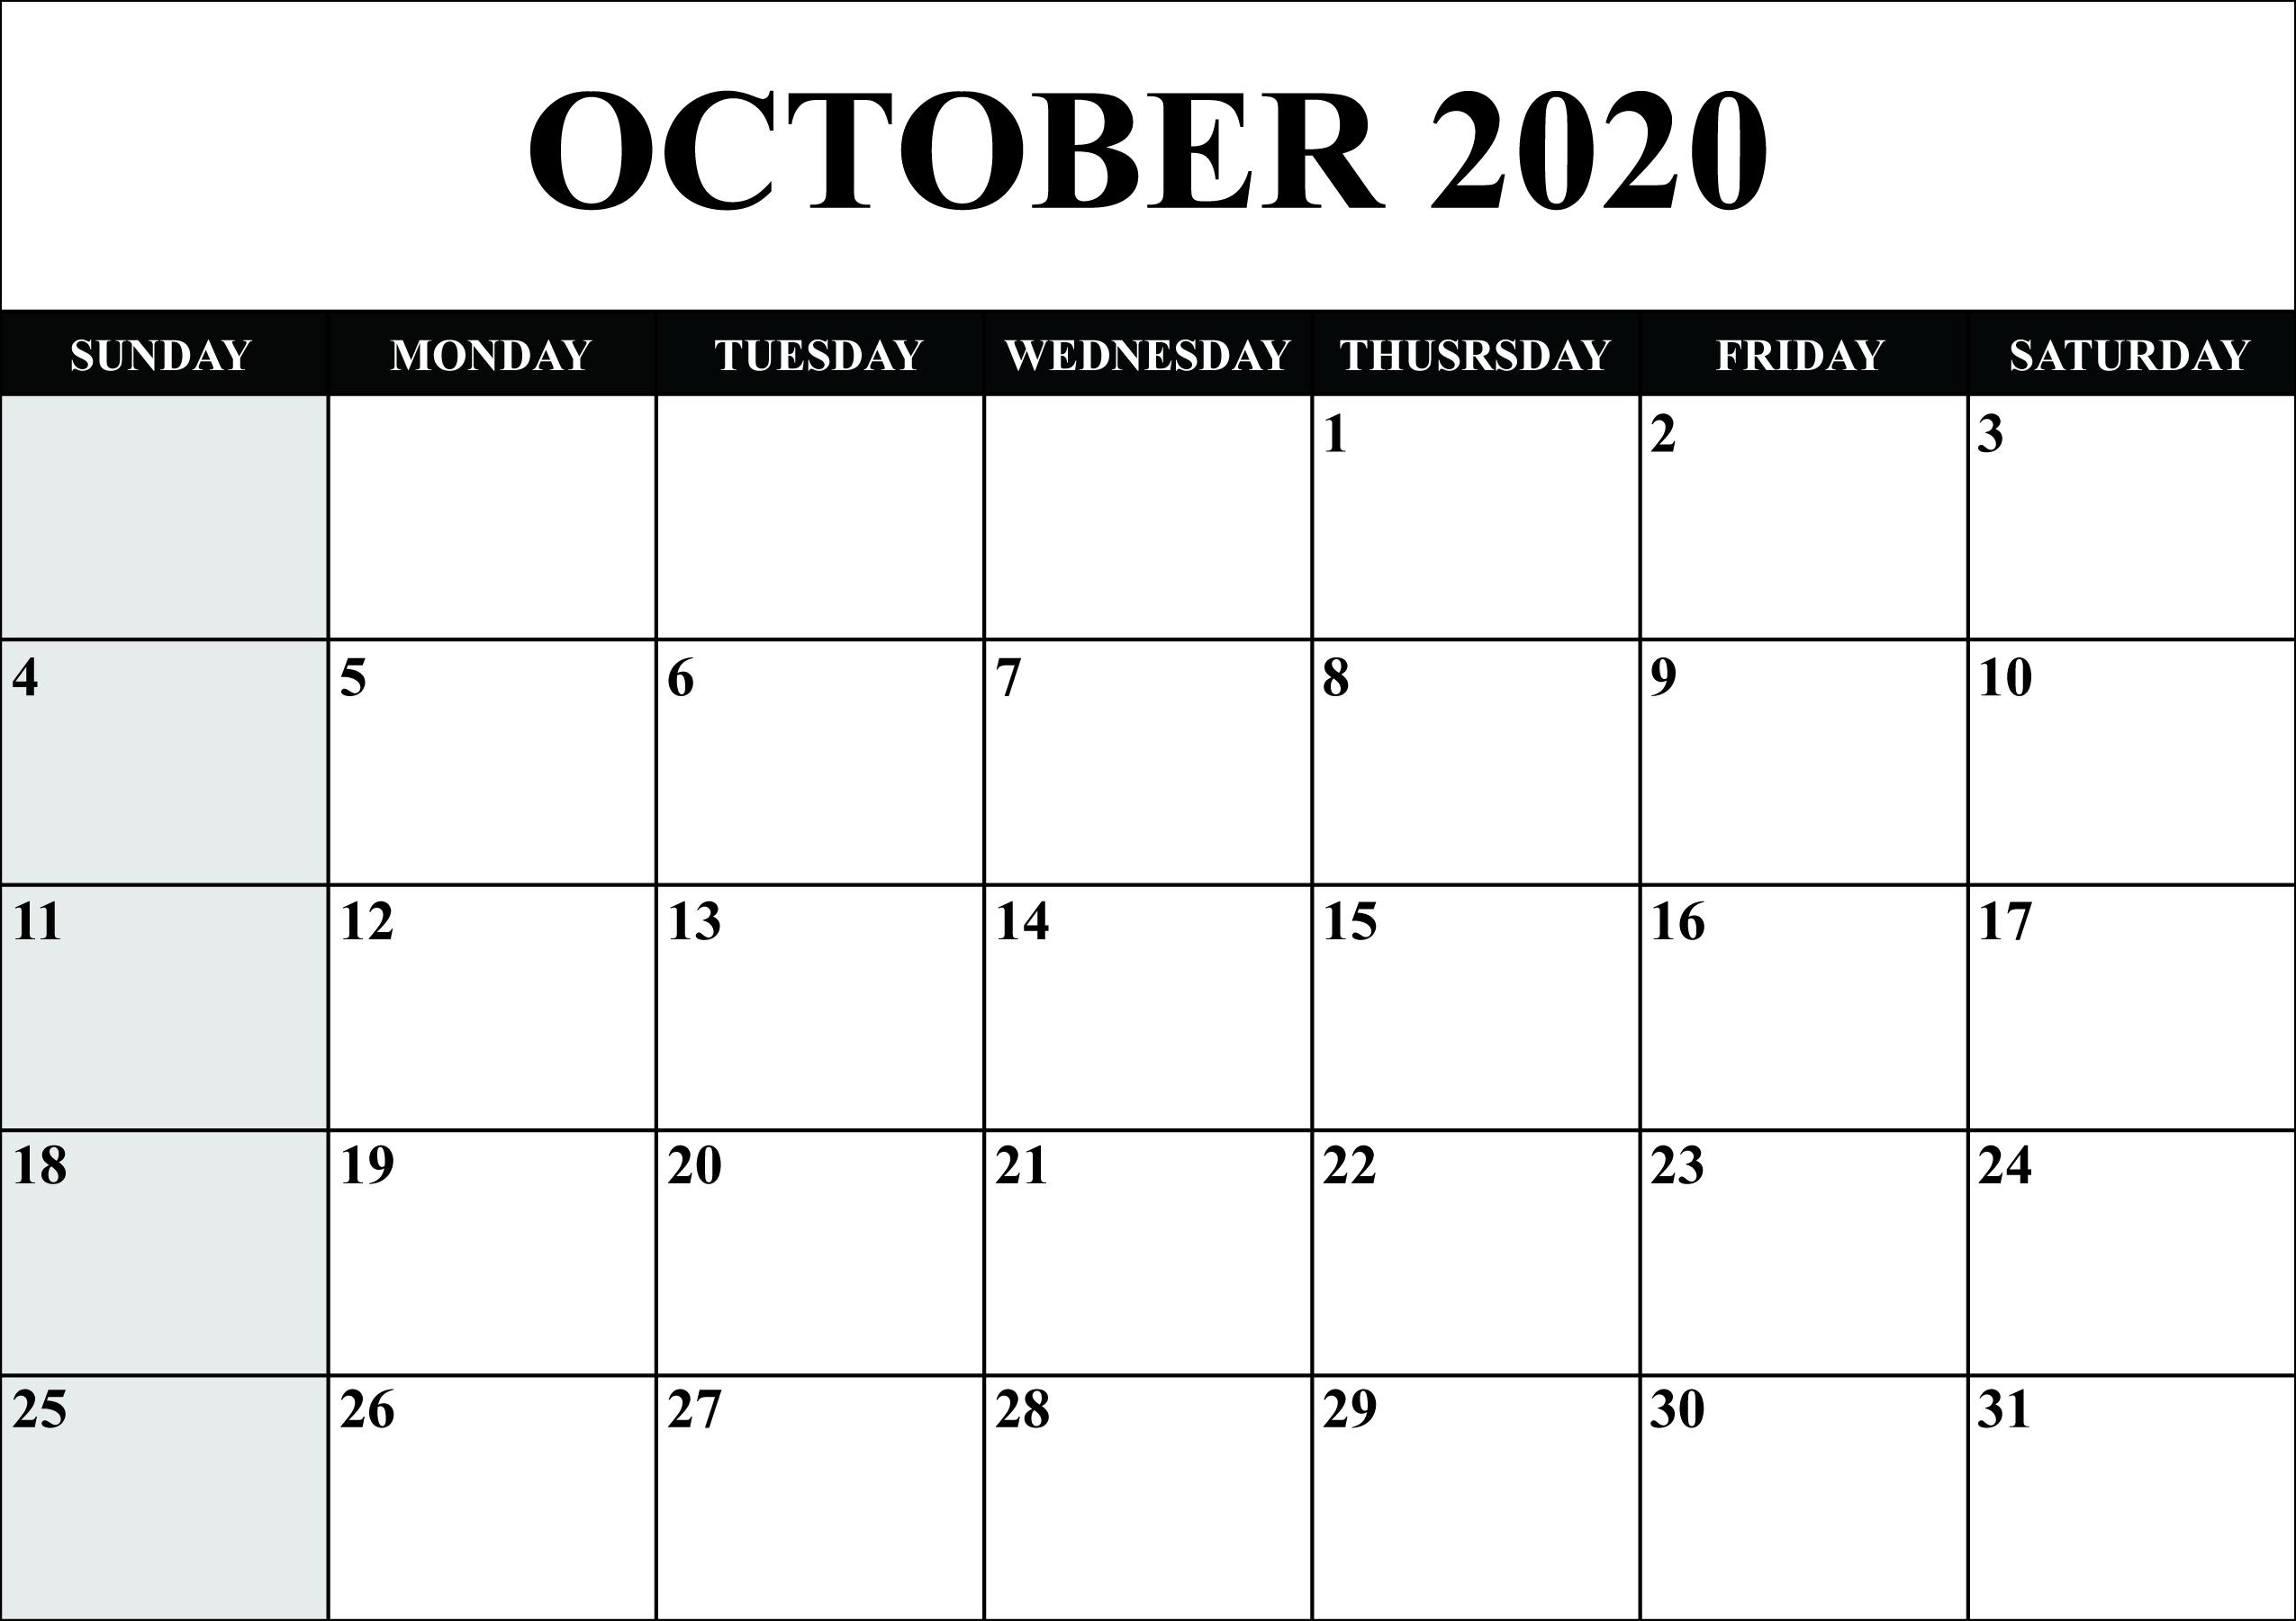 October 2020 Calendar Blank